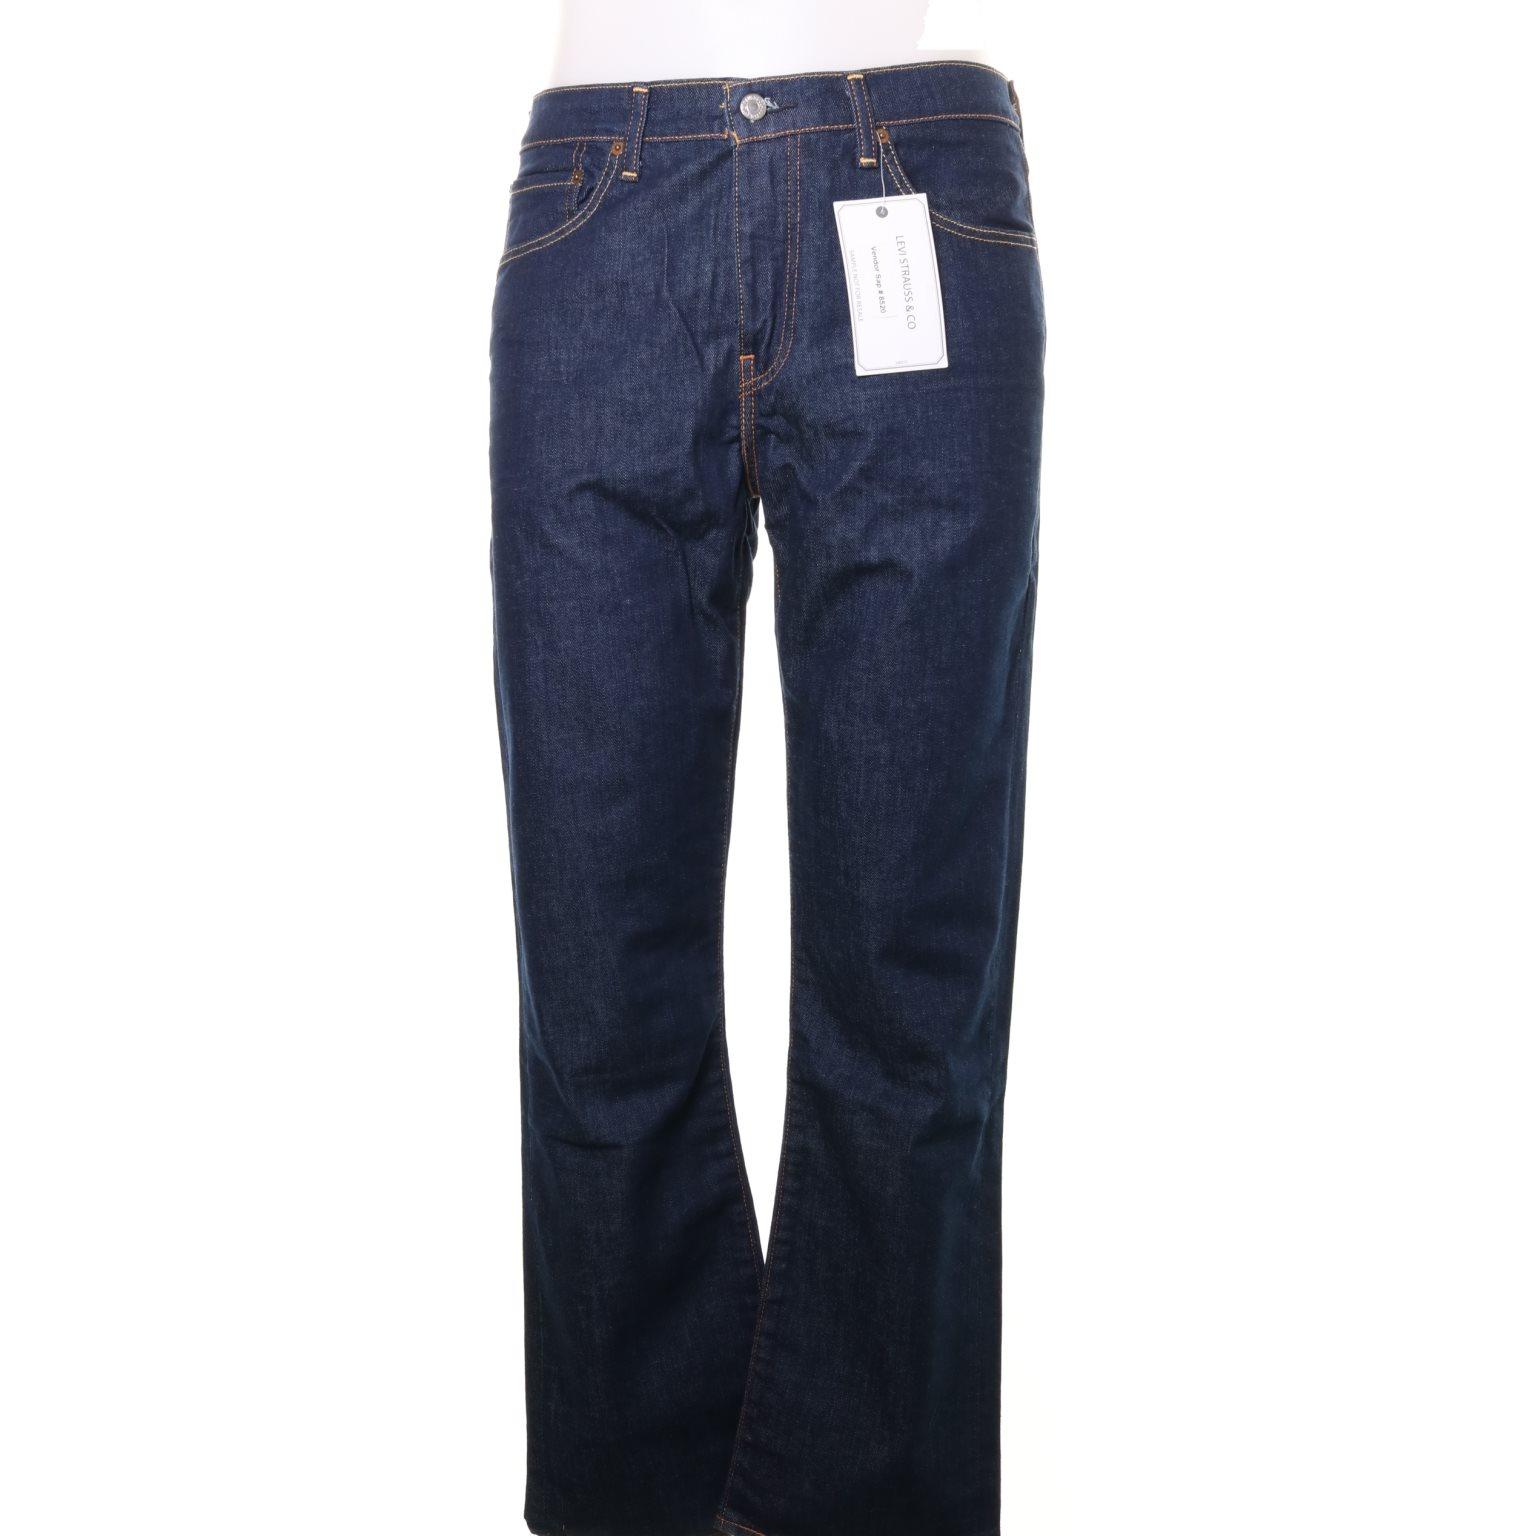 f97f1b70 Levi Strauss & Co, Jeans, Strl: 32/32, 75.. (341238424) ᐈ Sellpy på ...